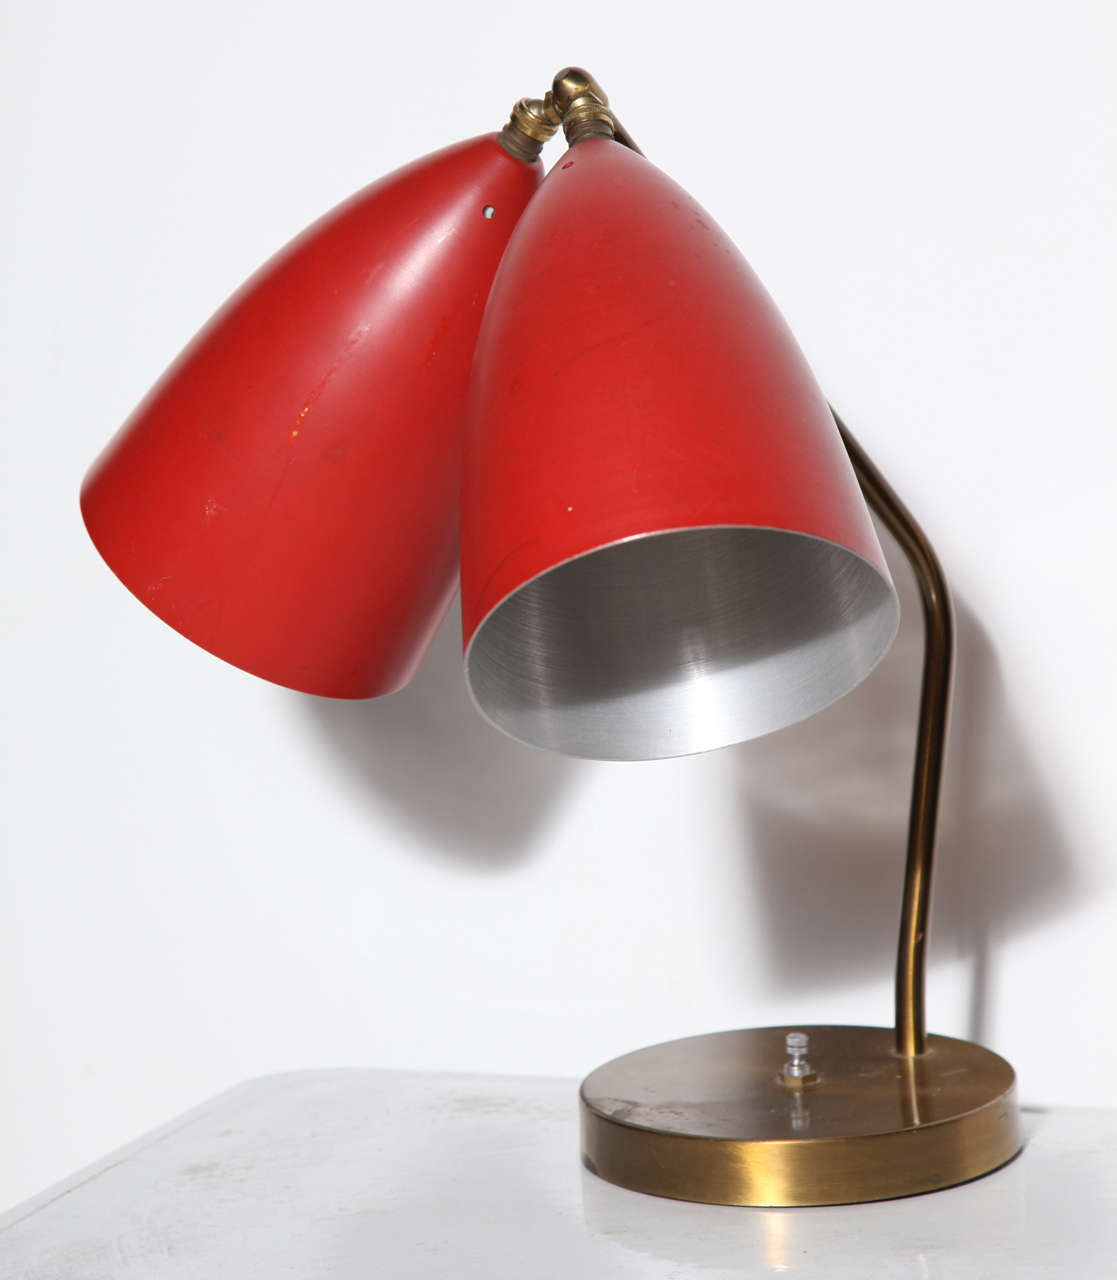 grossman lighting. Mid-Century Modern Rare 1940s Greta Grossman Magnusson Double Cone Table Lamp For Sale Lighting G